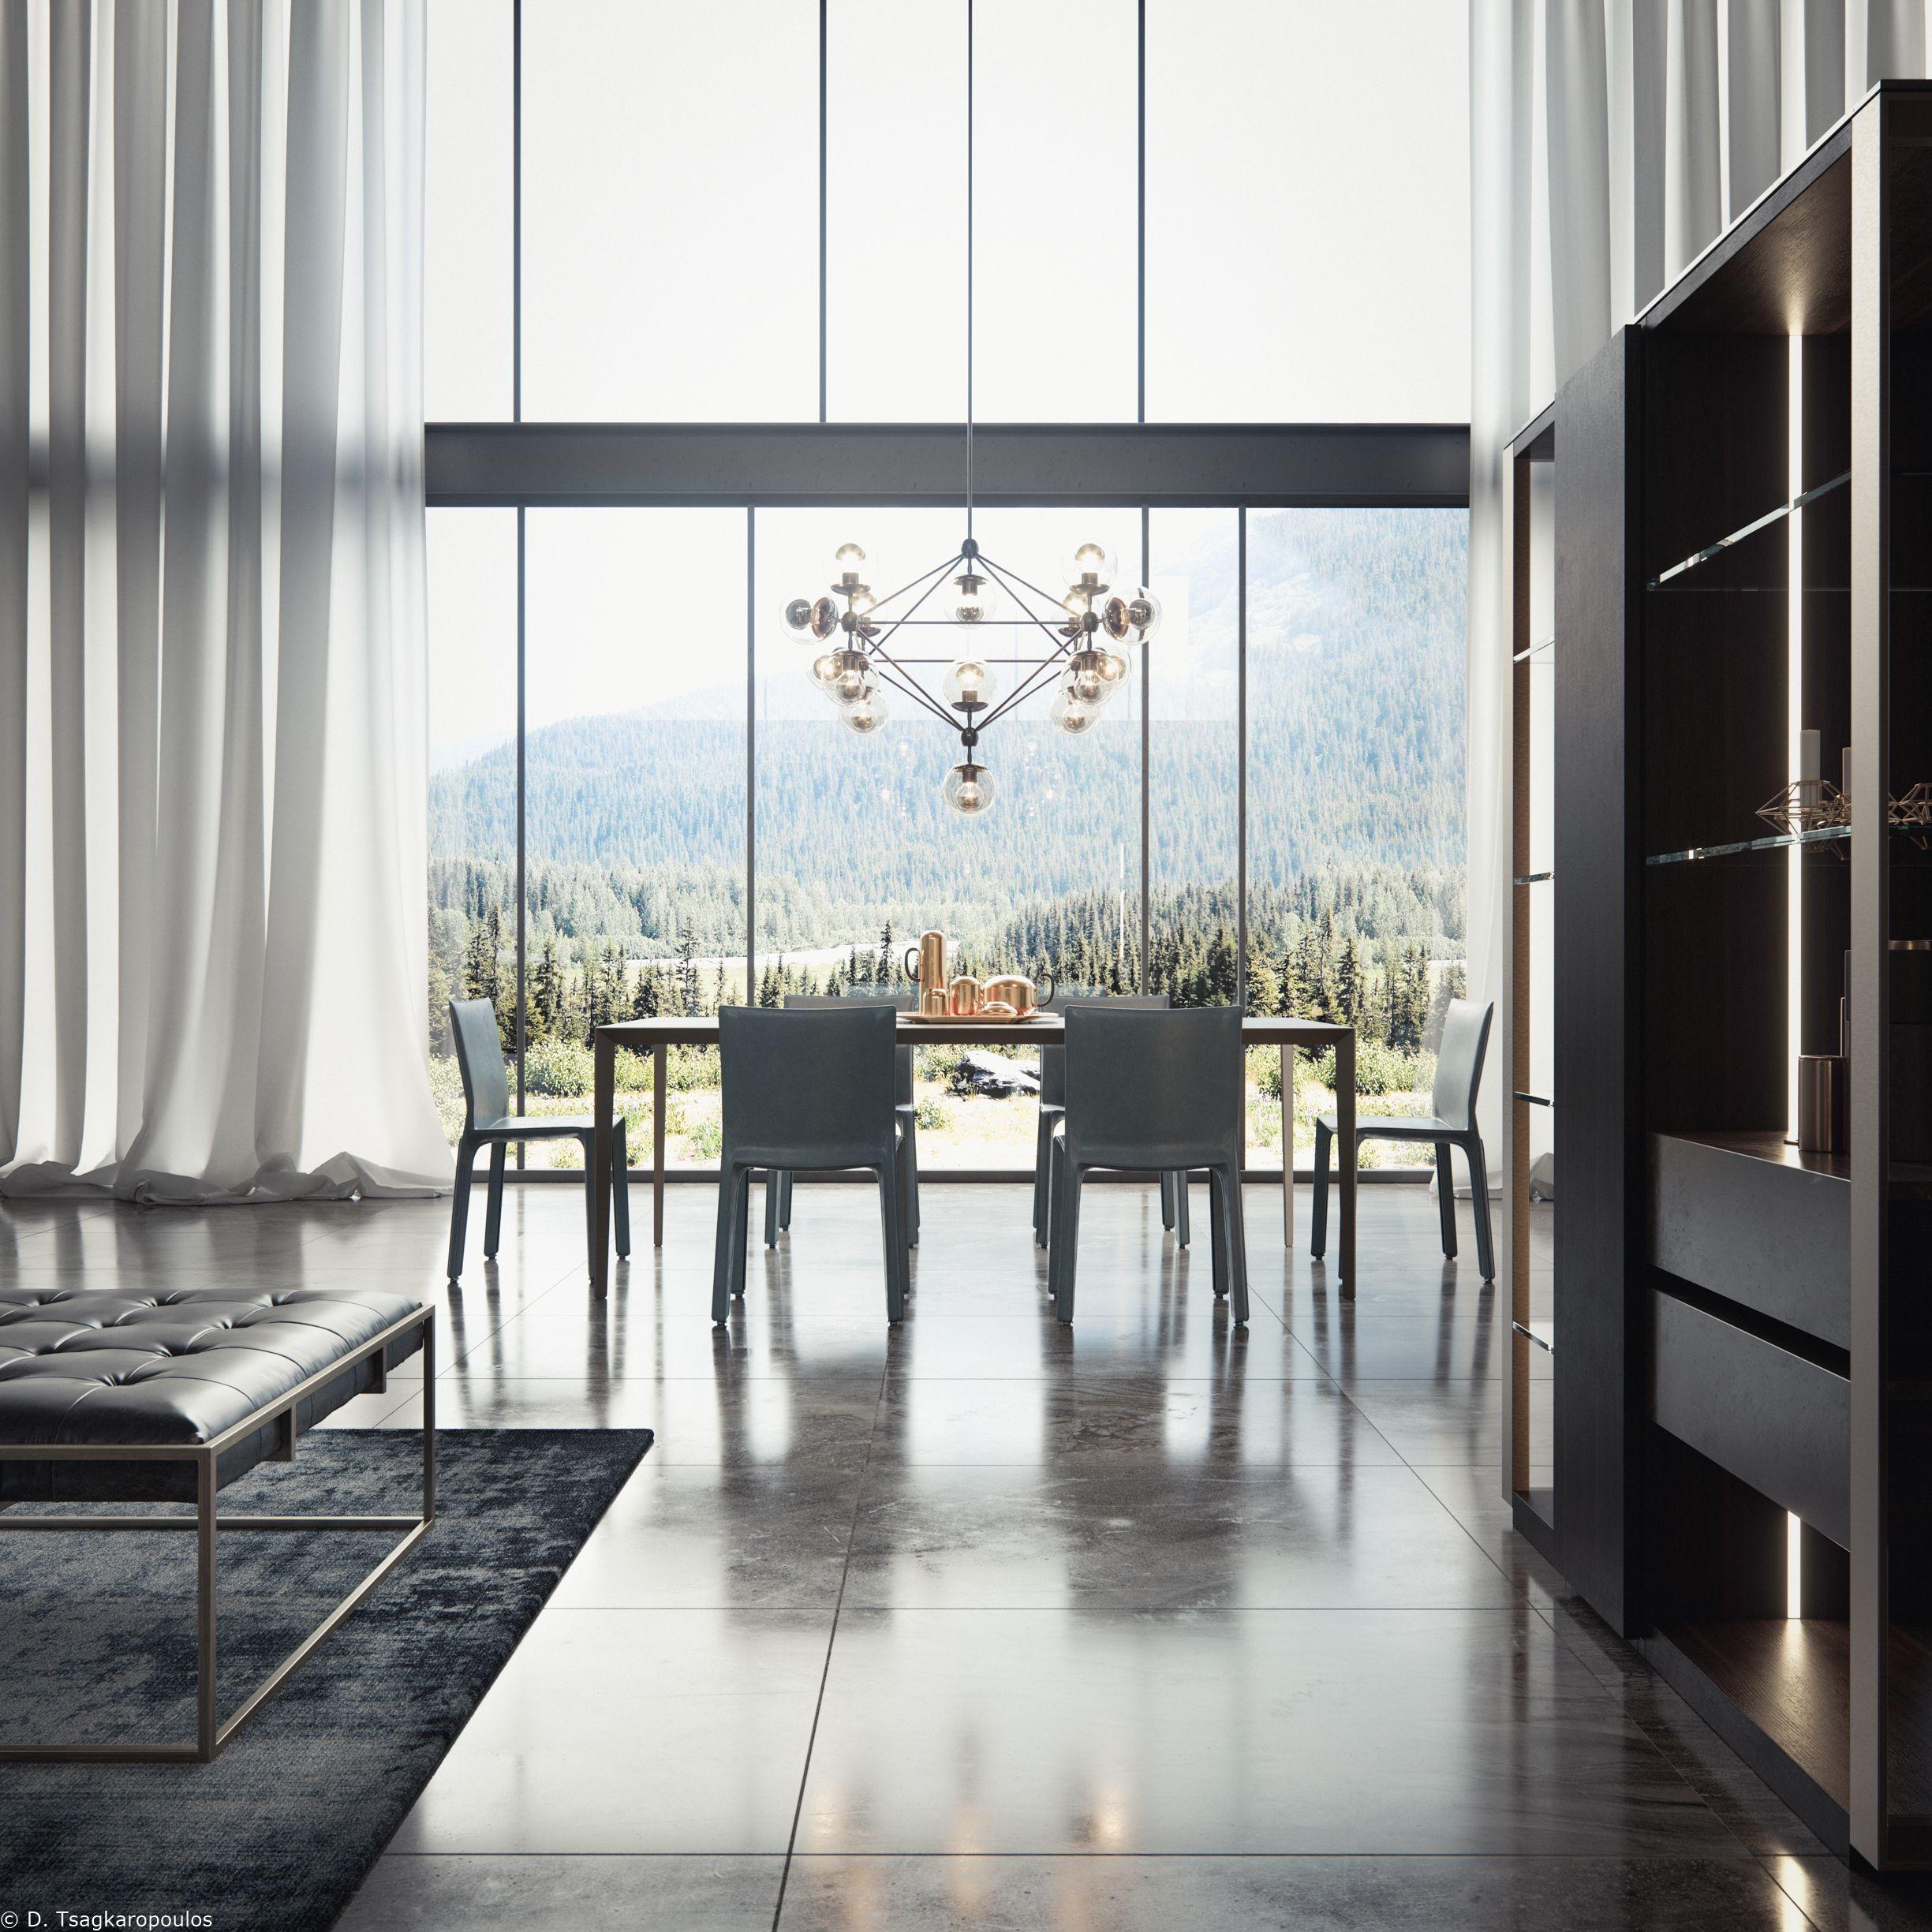 Tisettanta Metropolis Photorealistic 3D visualization